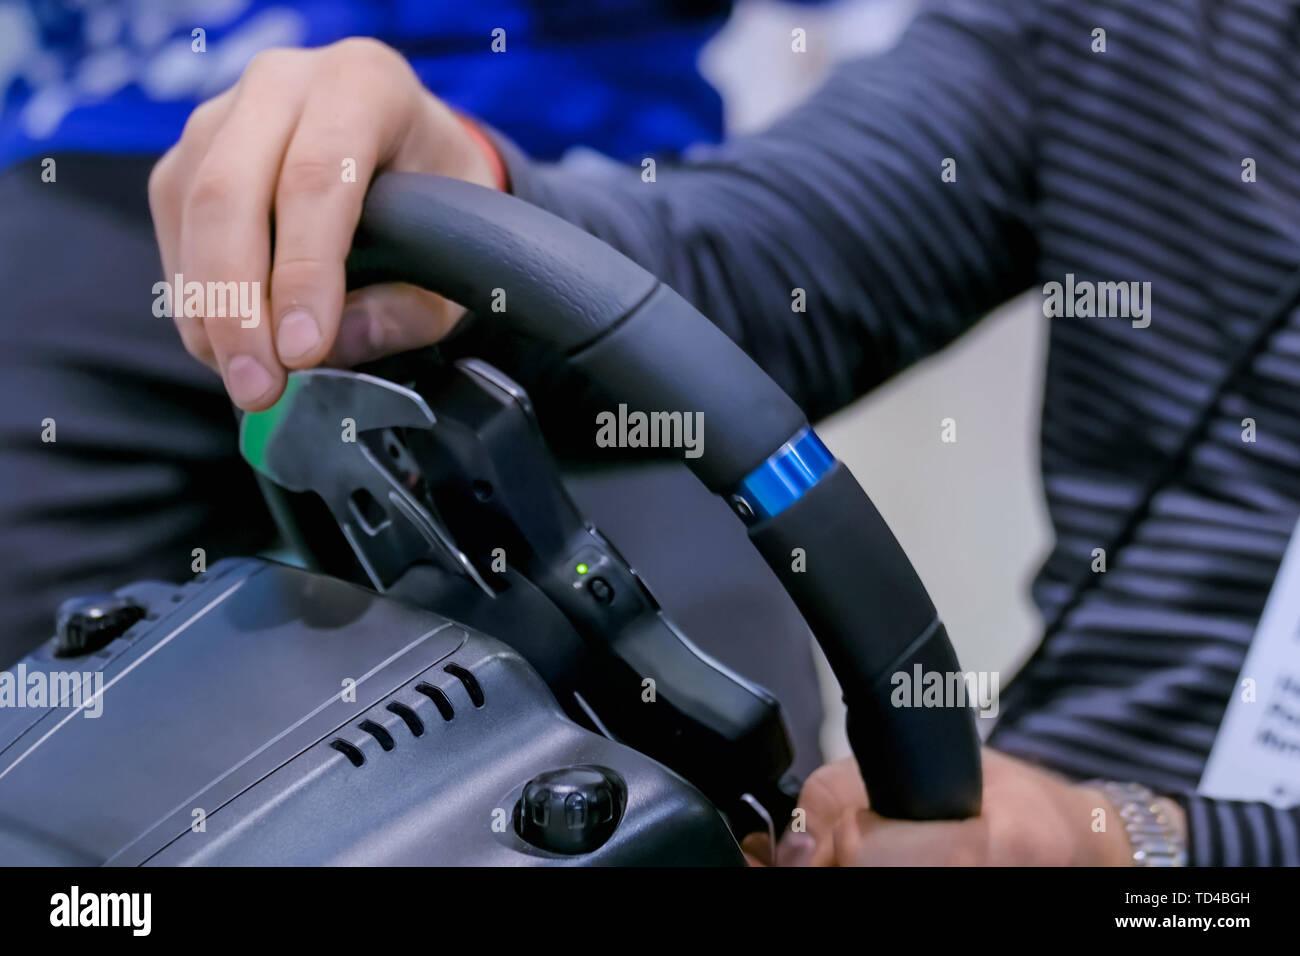 Man using gaming steering wheel joystick at technology exhibition - Stock Image